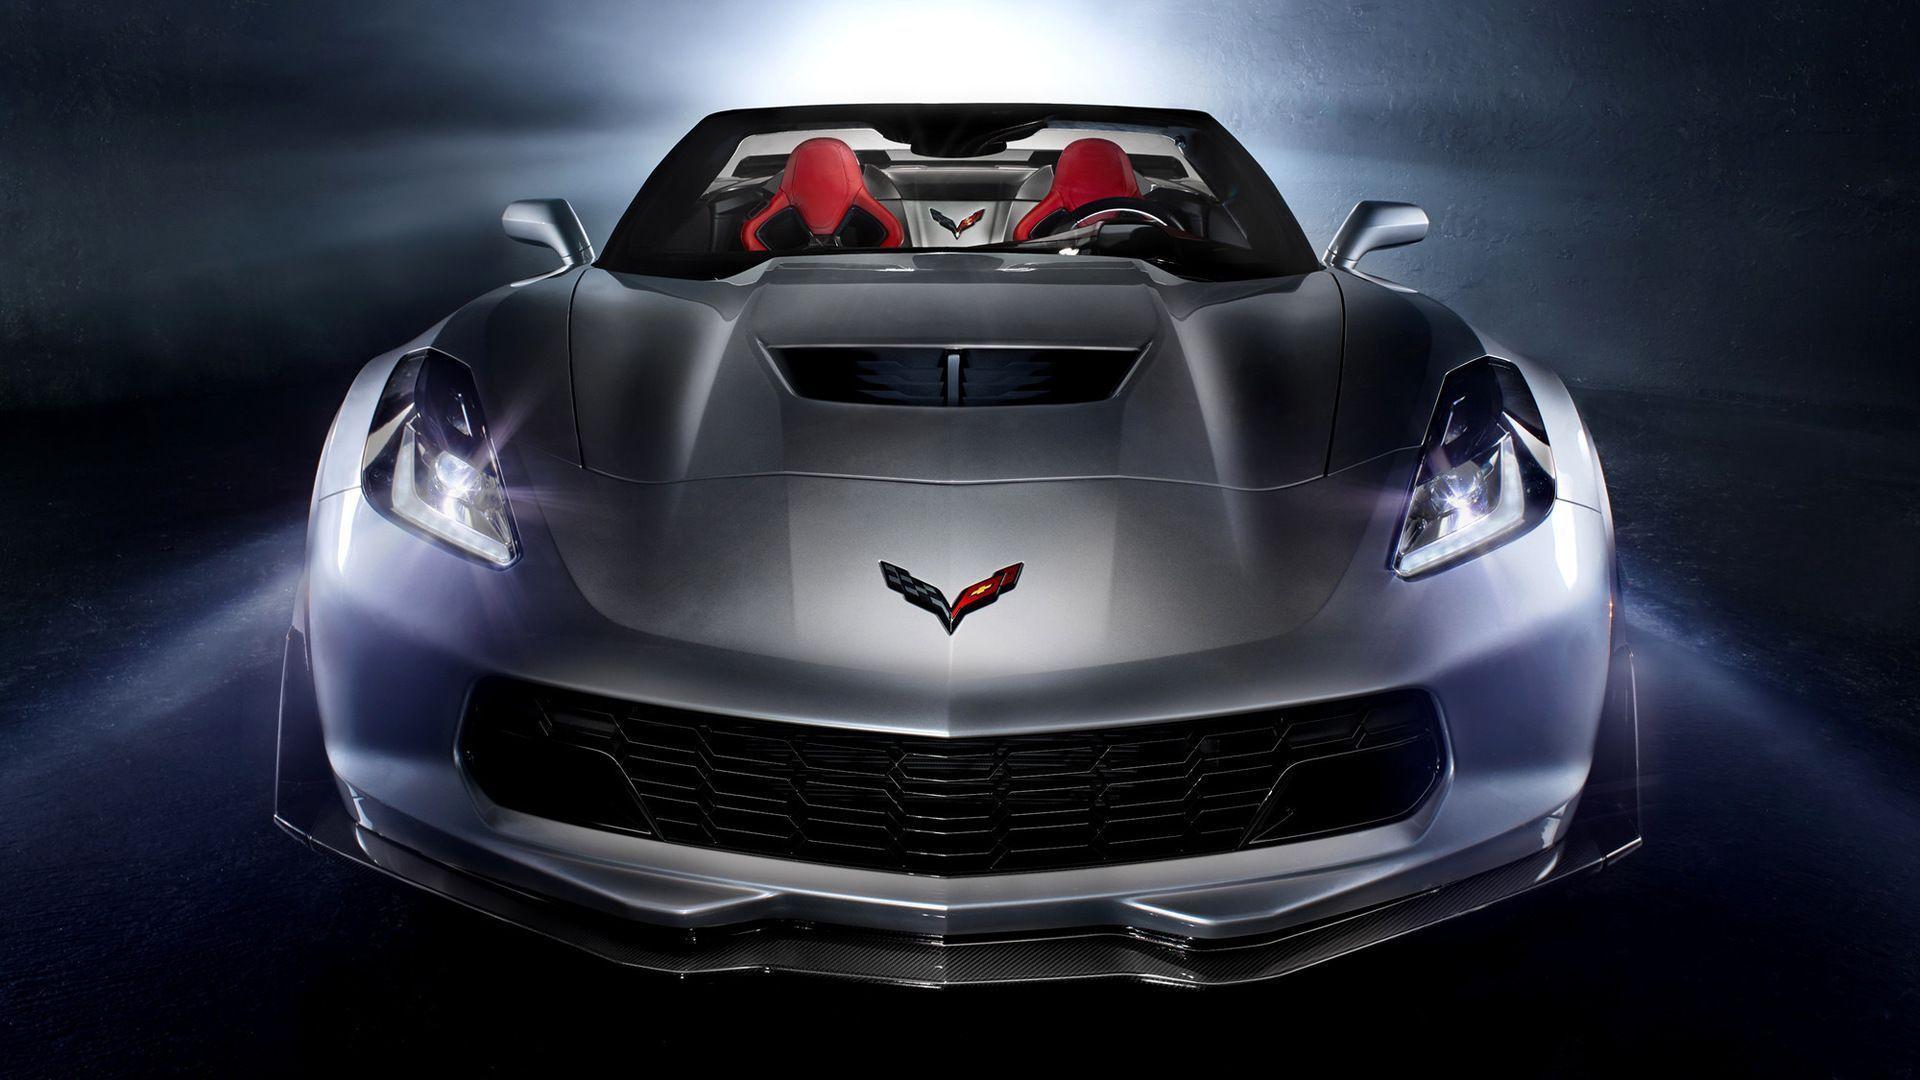 Corvette 2015 Wallpapers Hd Wallpaper Cave